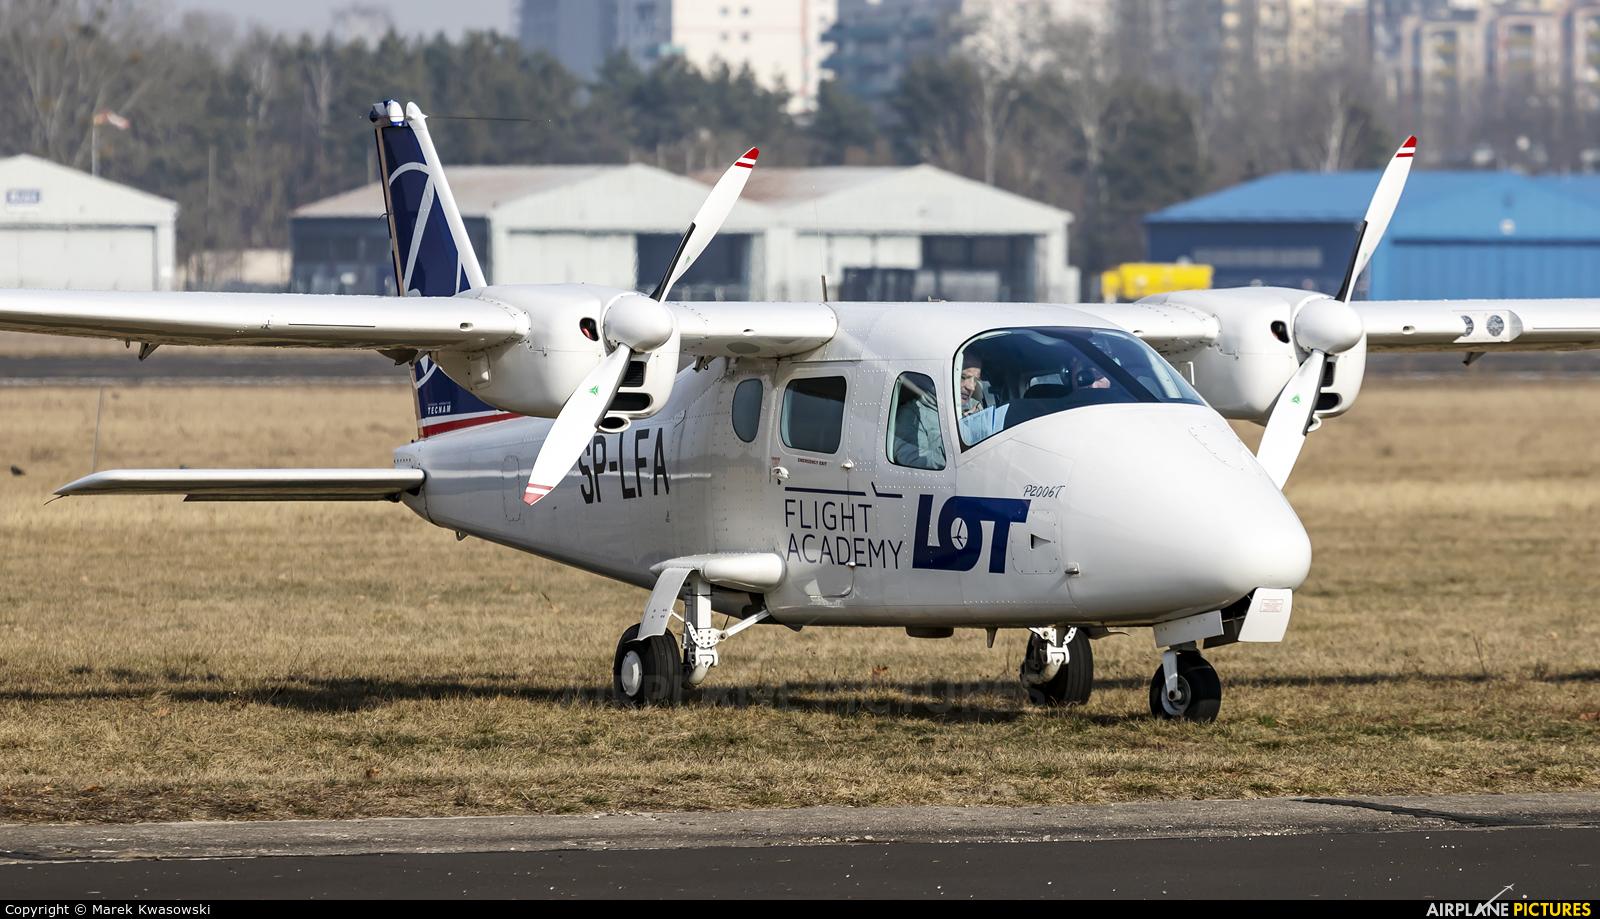 LOT Flight Academy SP-LFA aircraft at Warsaw - Babice